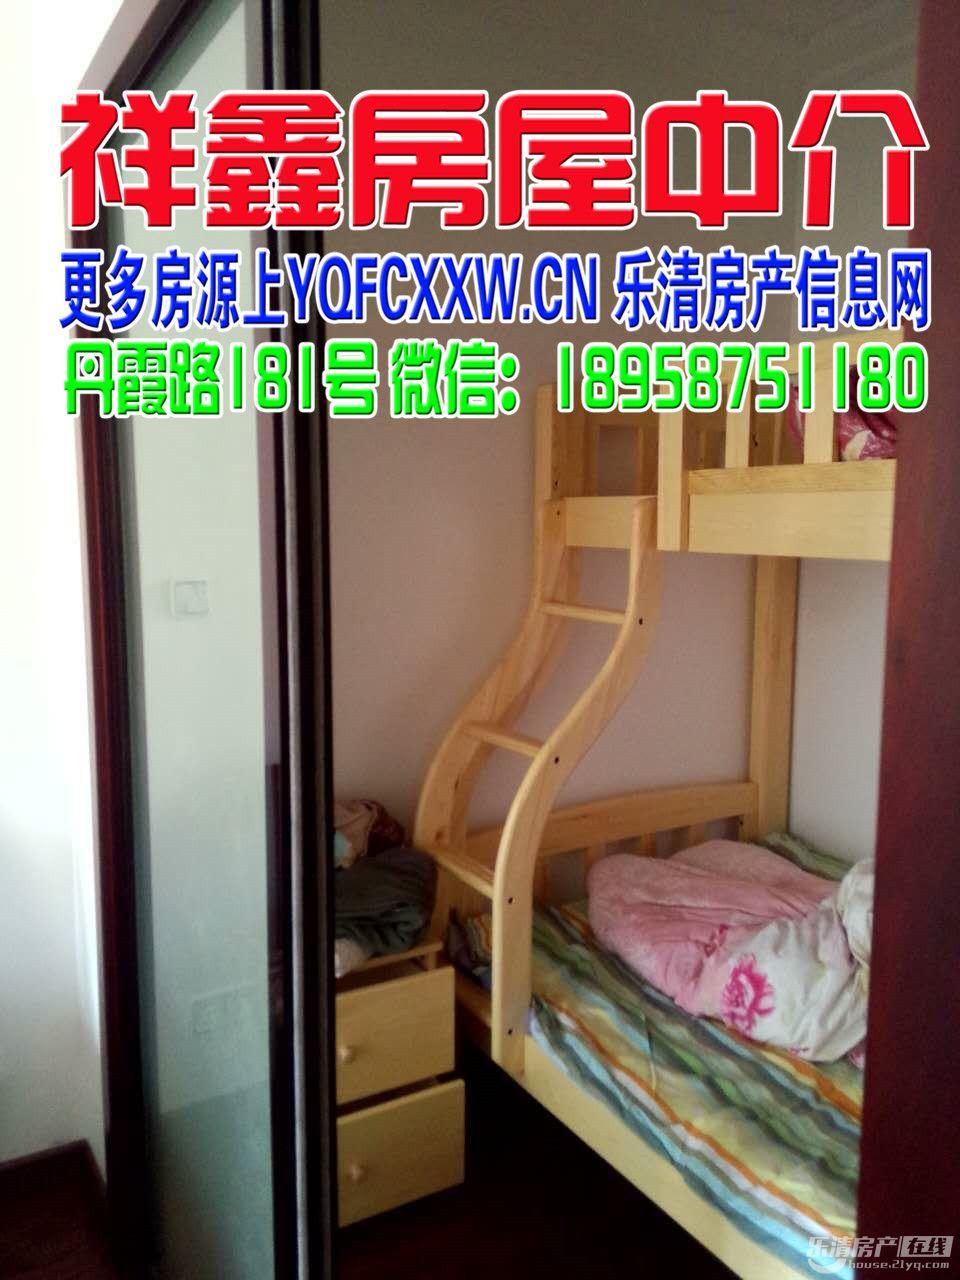 http://house.21yq.com/userfiles/image/20160630/3014114994061667457530.jpg